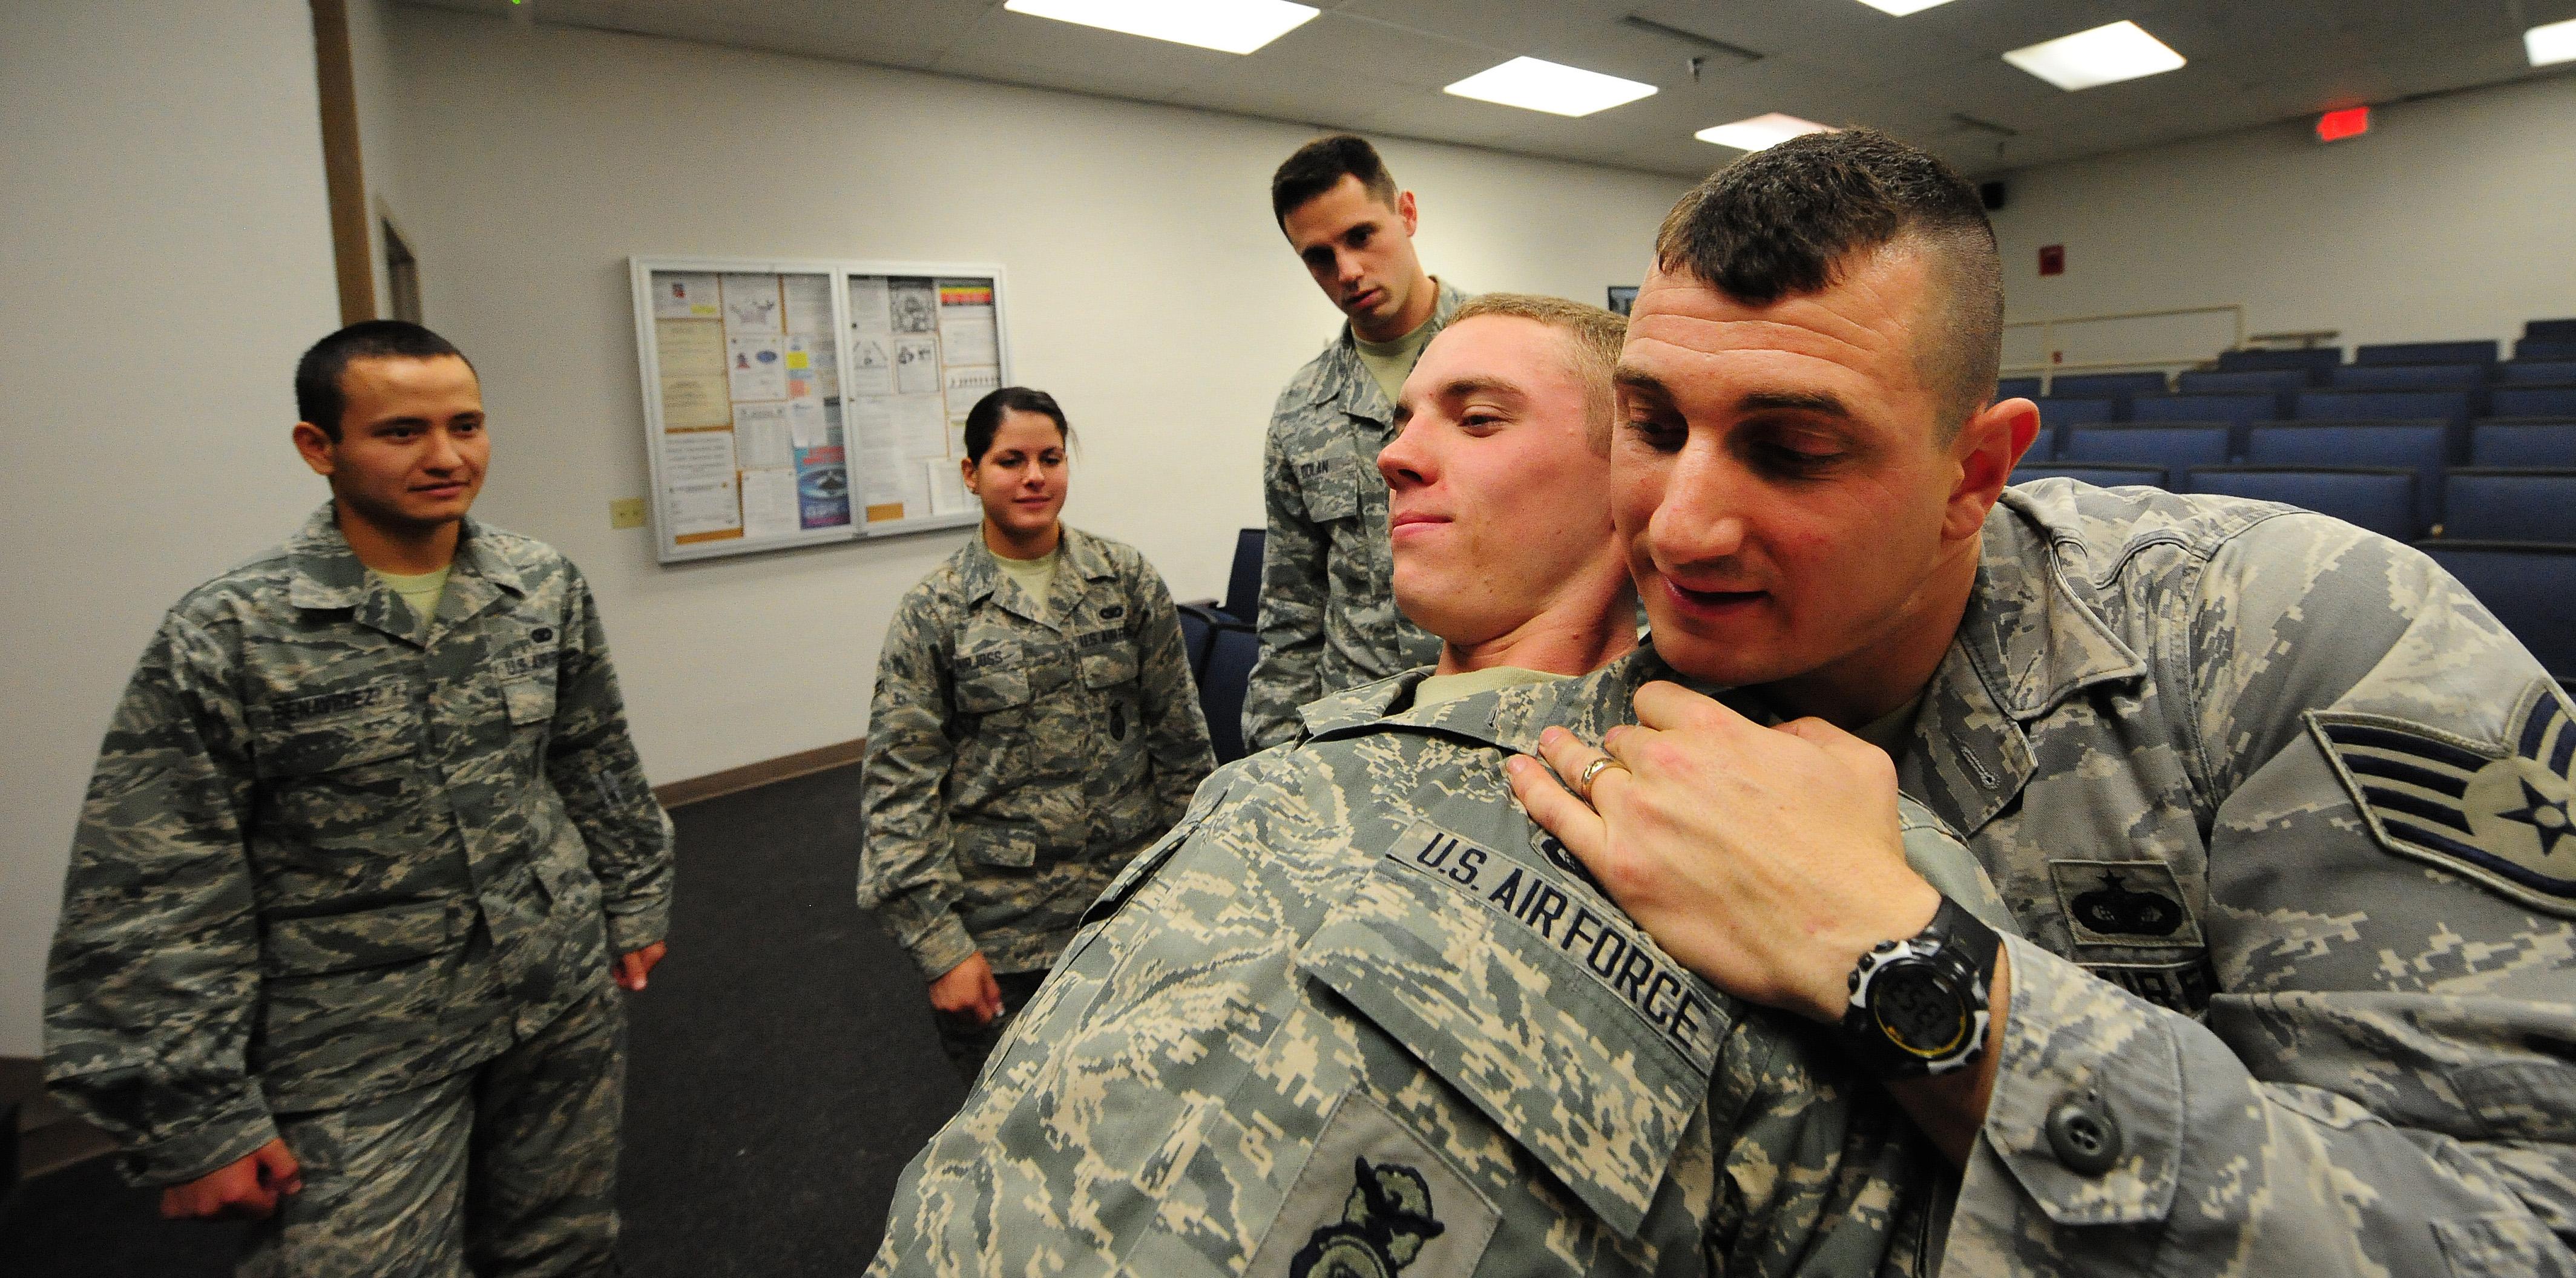 training tomorrow s defenders > whiteman air force base > display hi res photo details